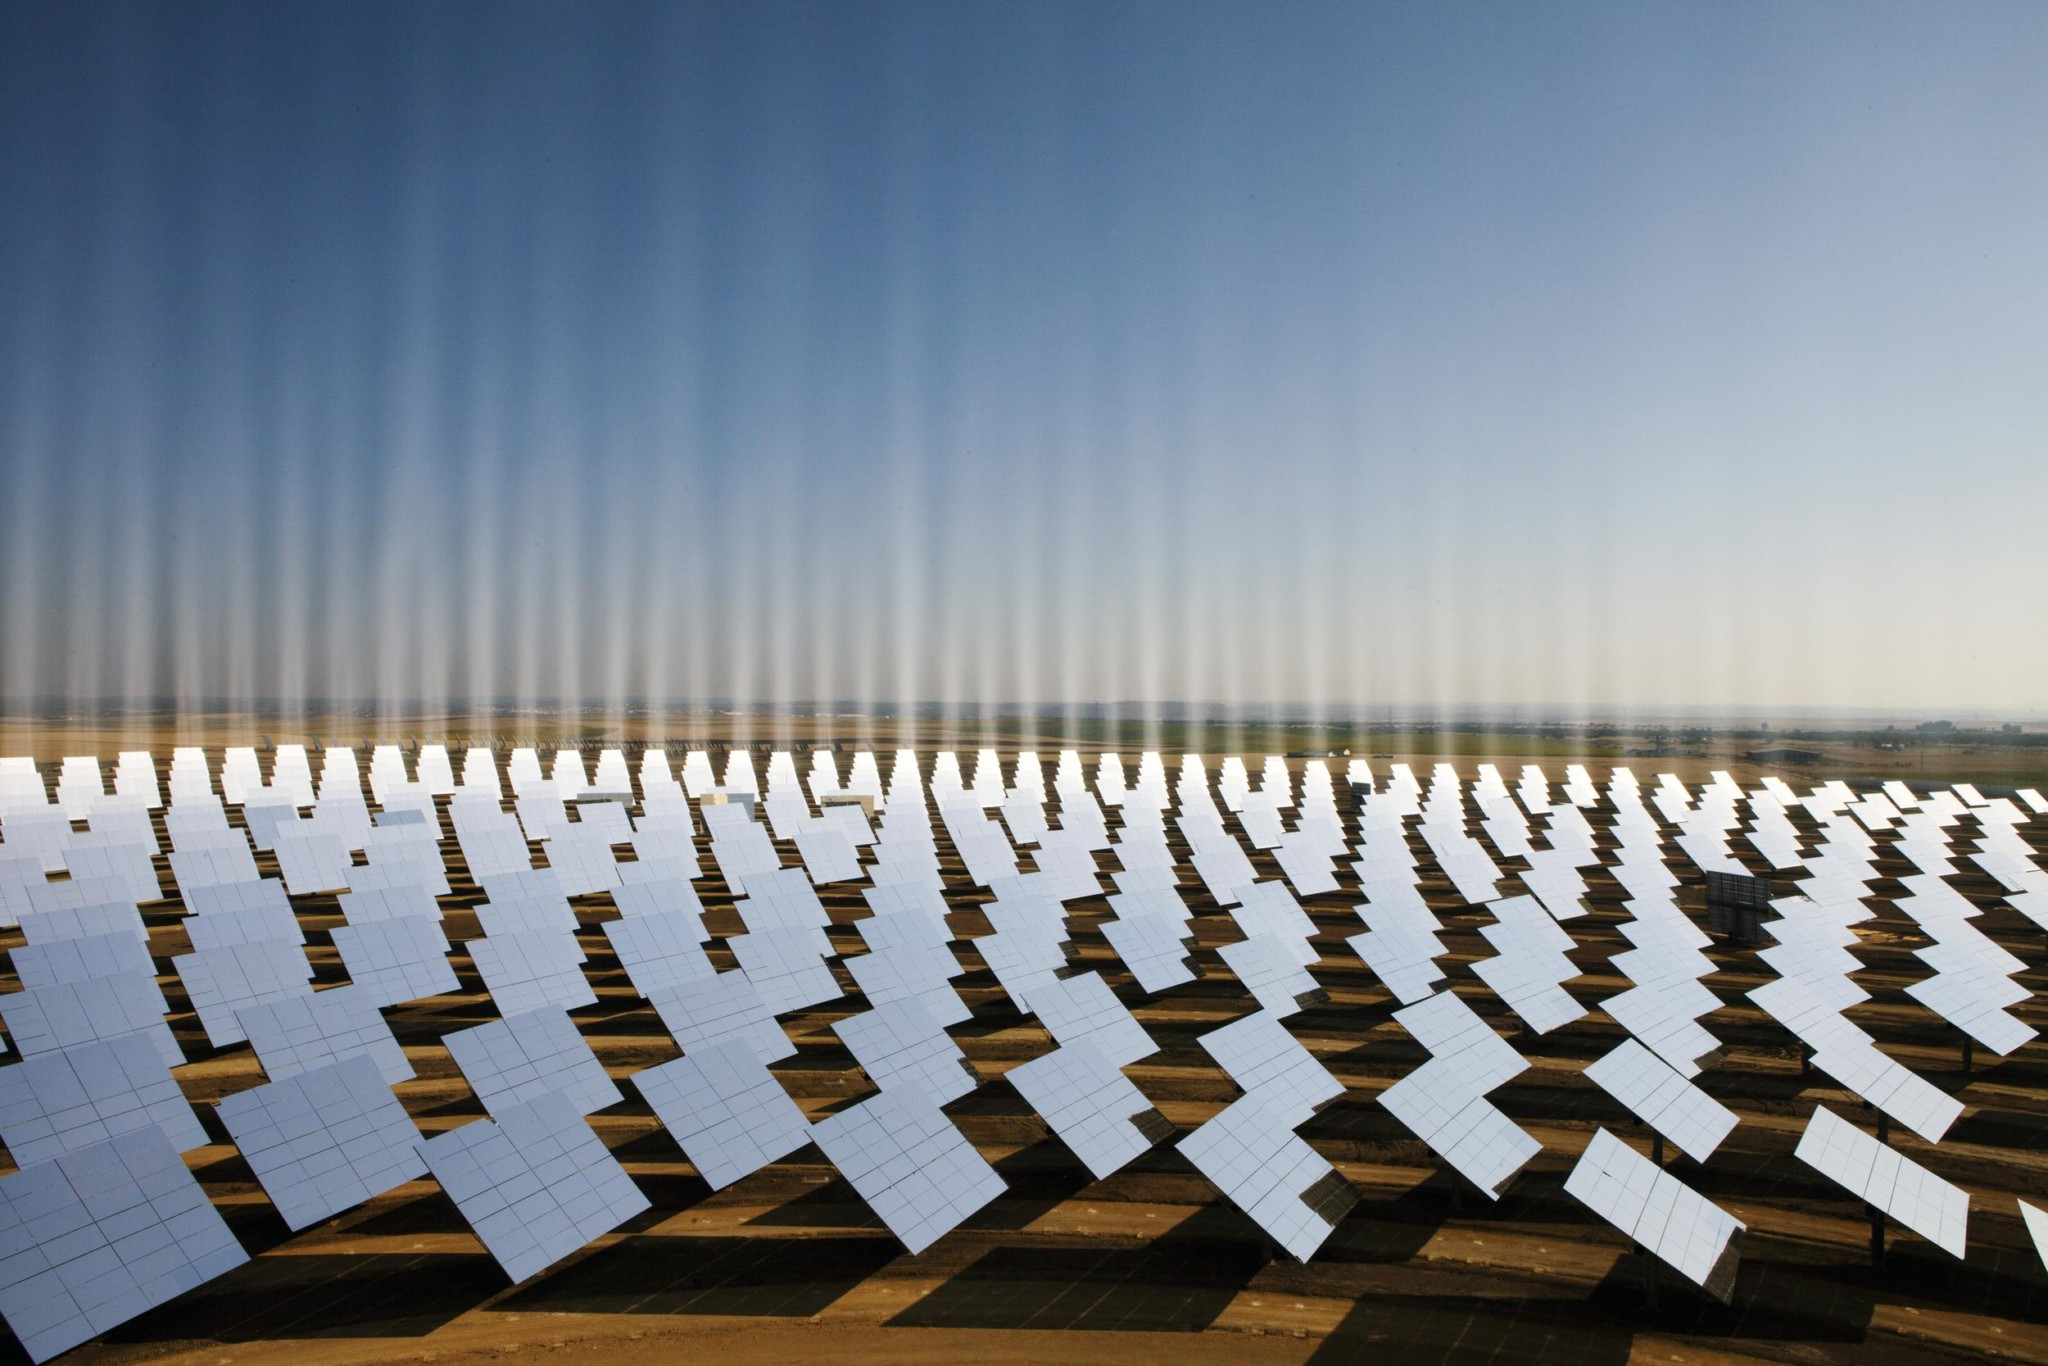 PS10 Solar Tower Plant in Spain. © Markel Redondo / Greenpeace